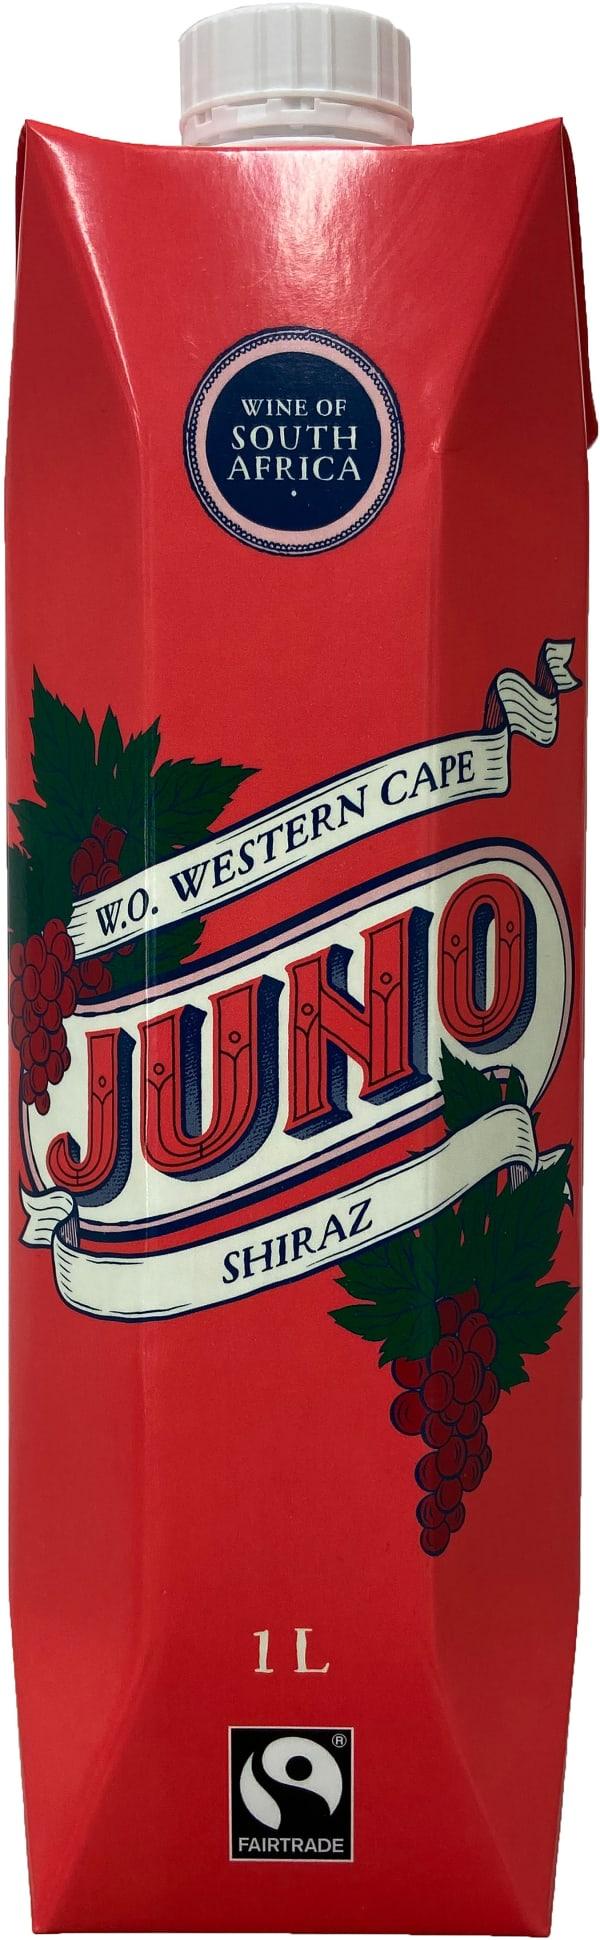 Juno Shiraz 2017 carton package